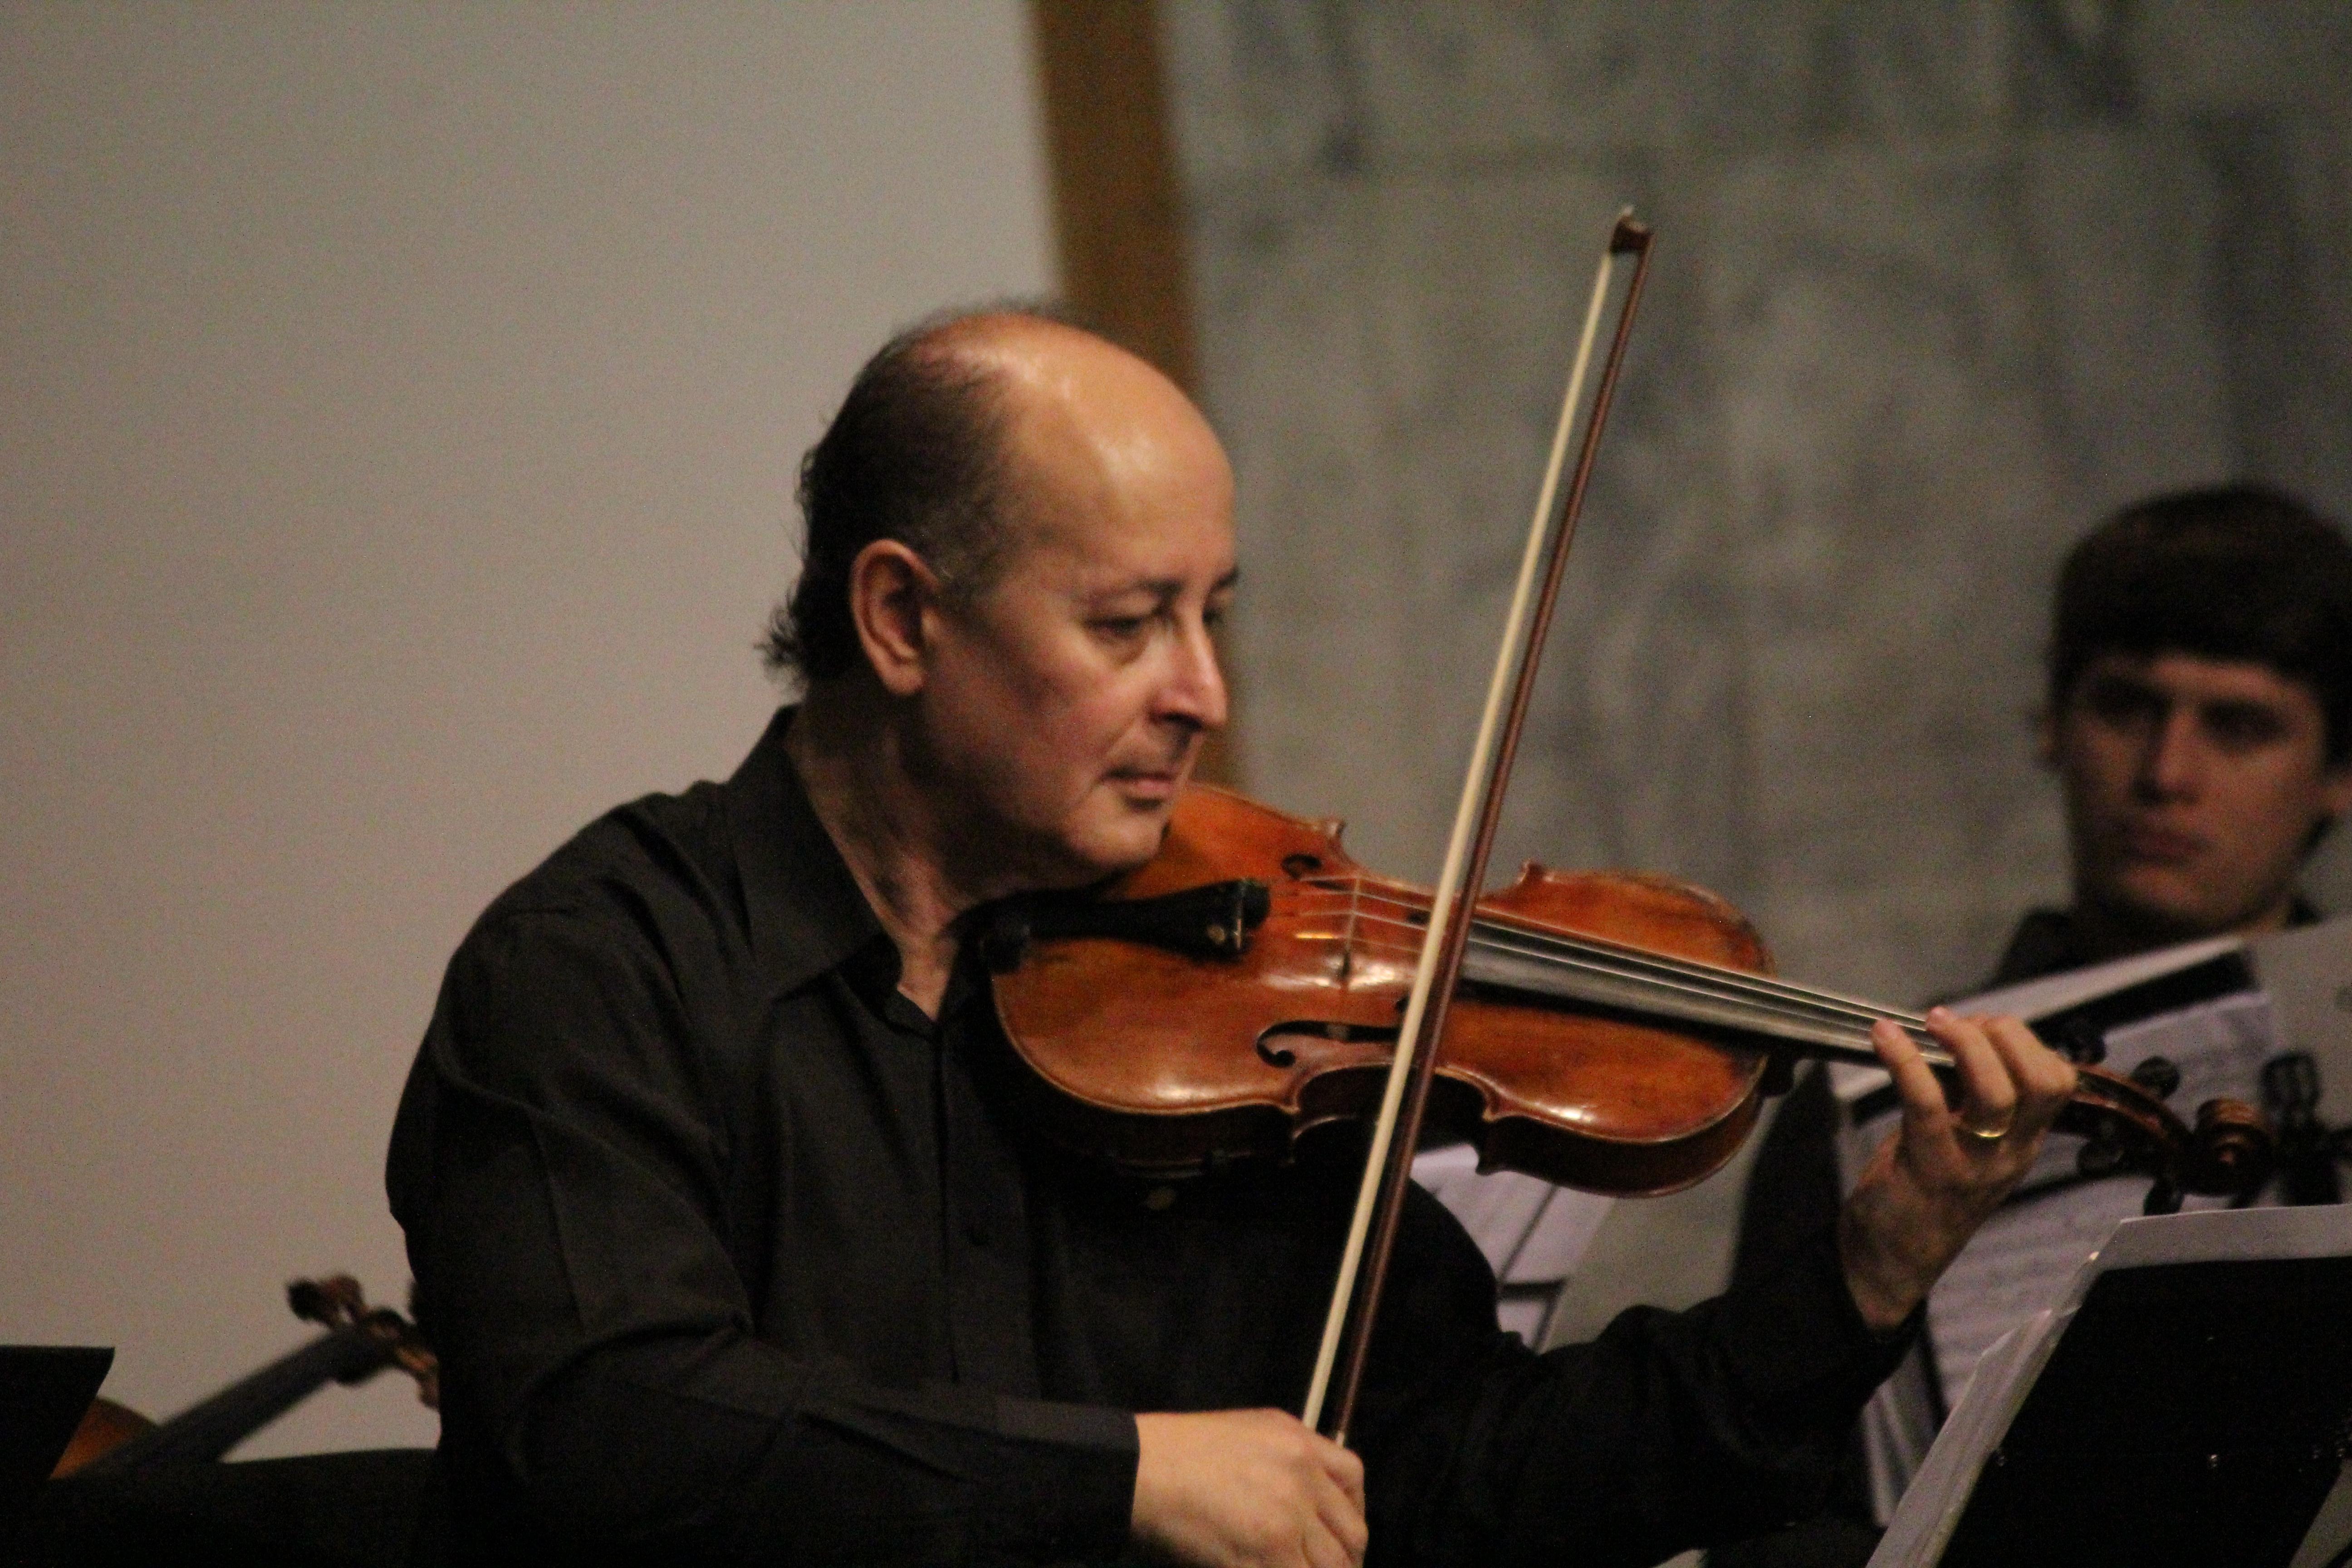 Jean Reis